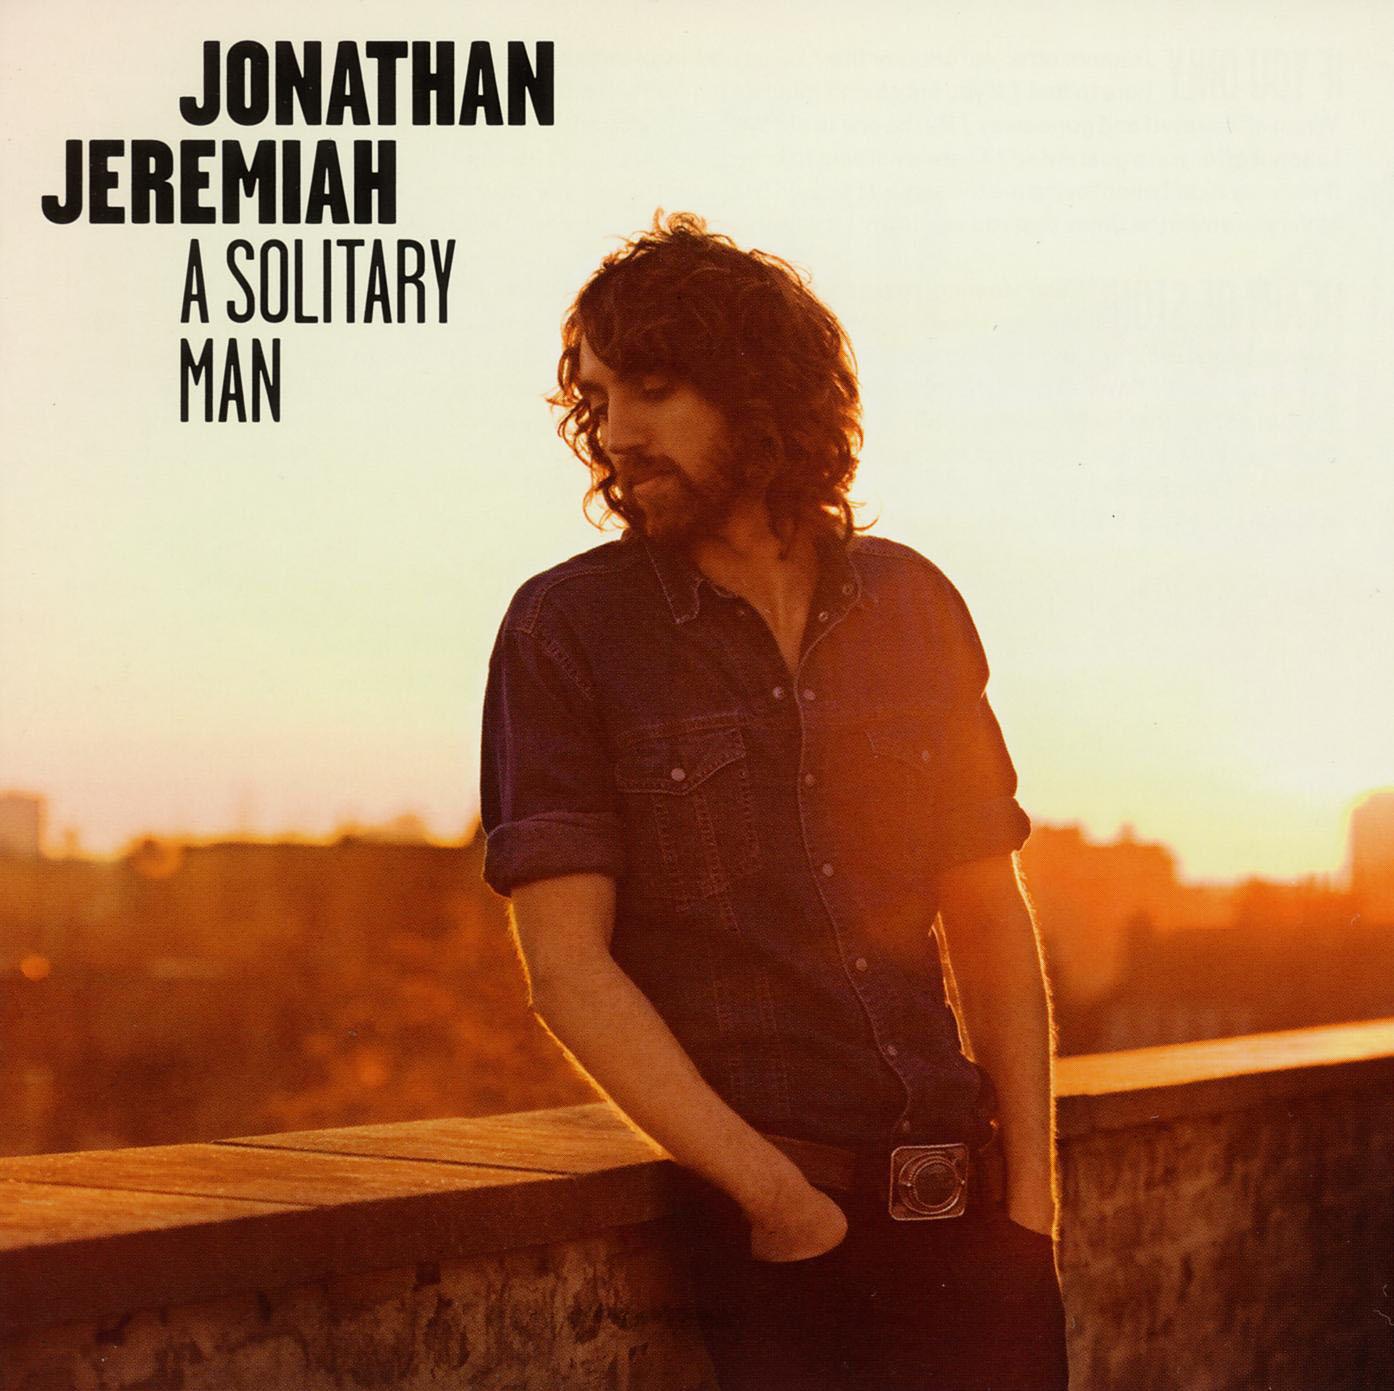 Jonathan Jeremiah- A Solitary Man